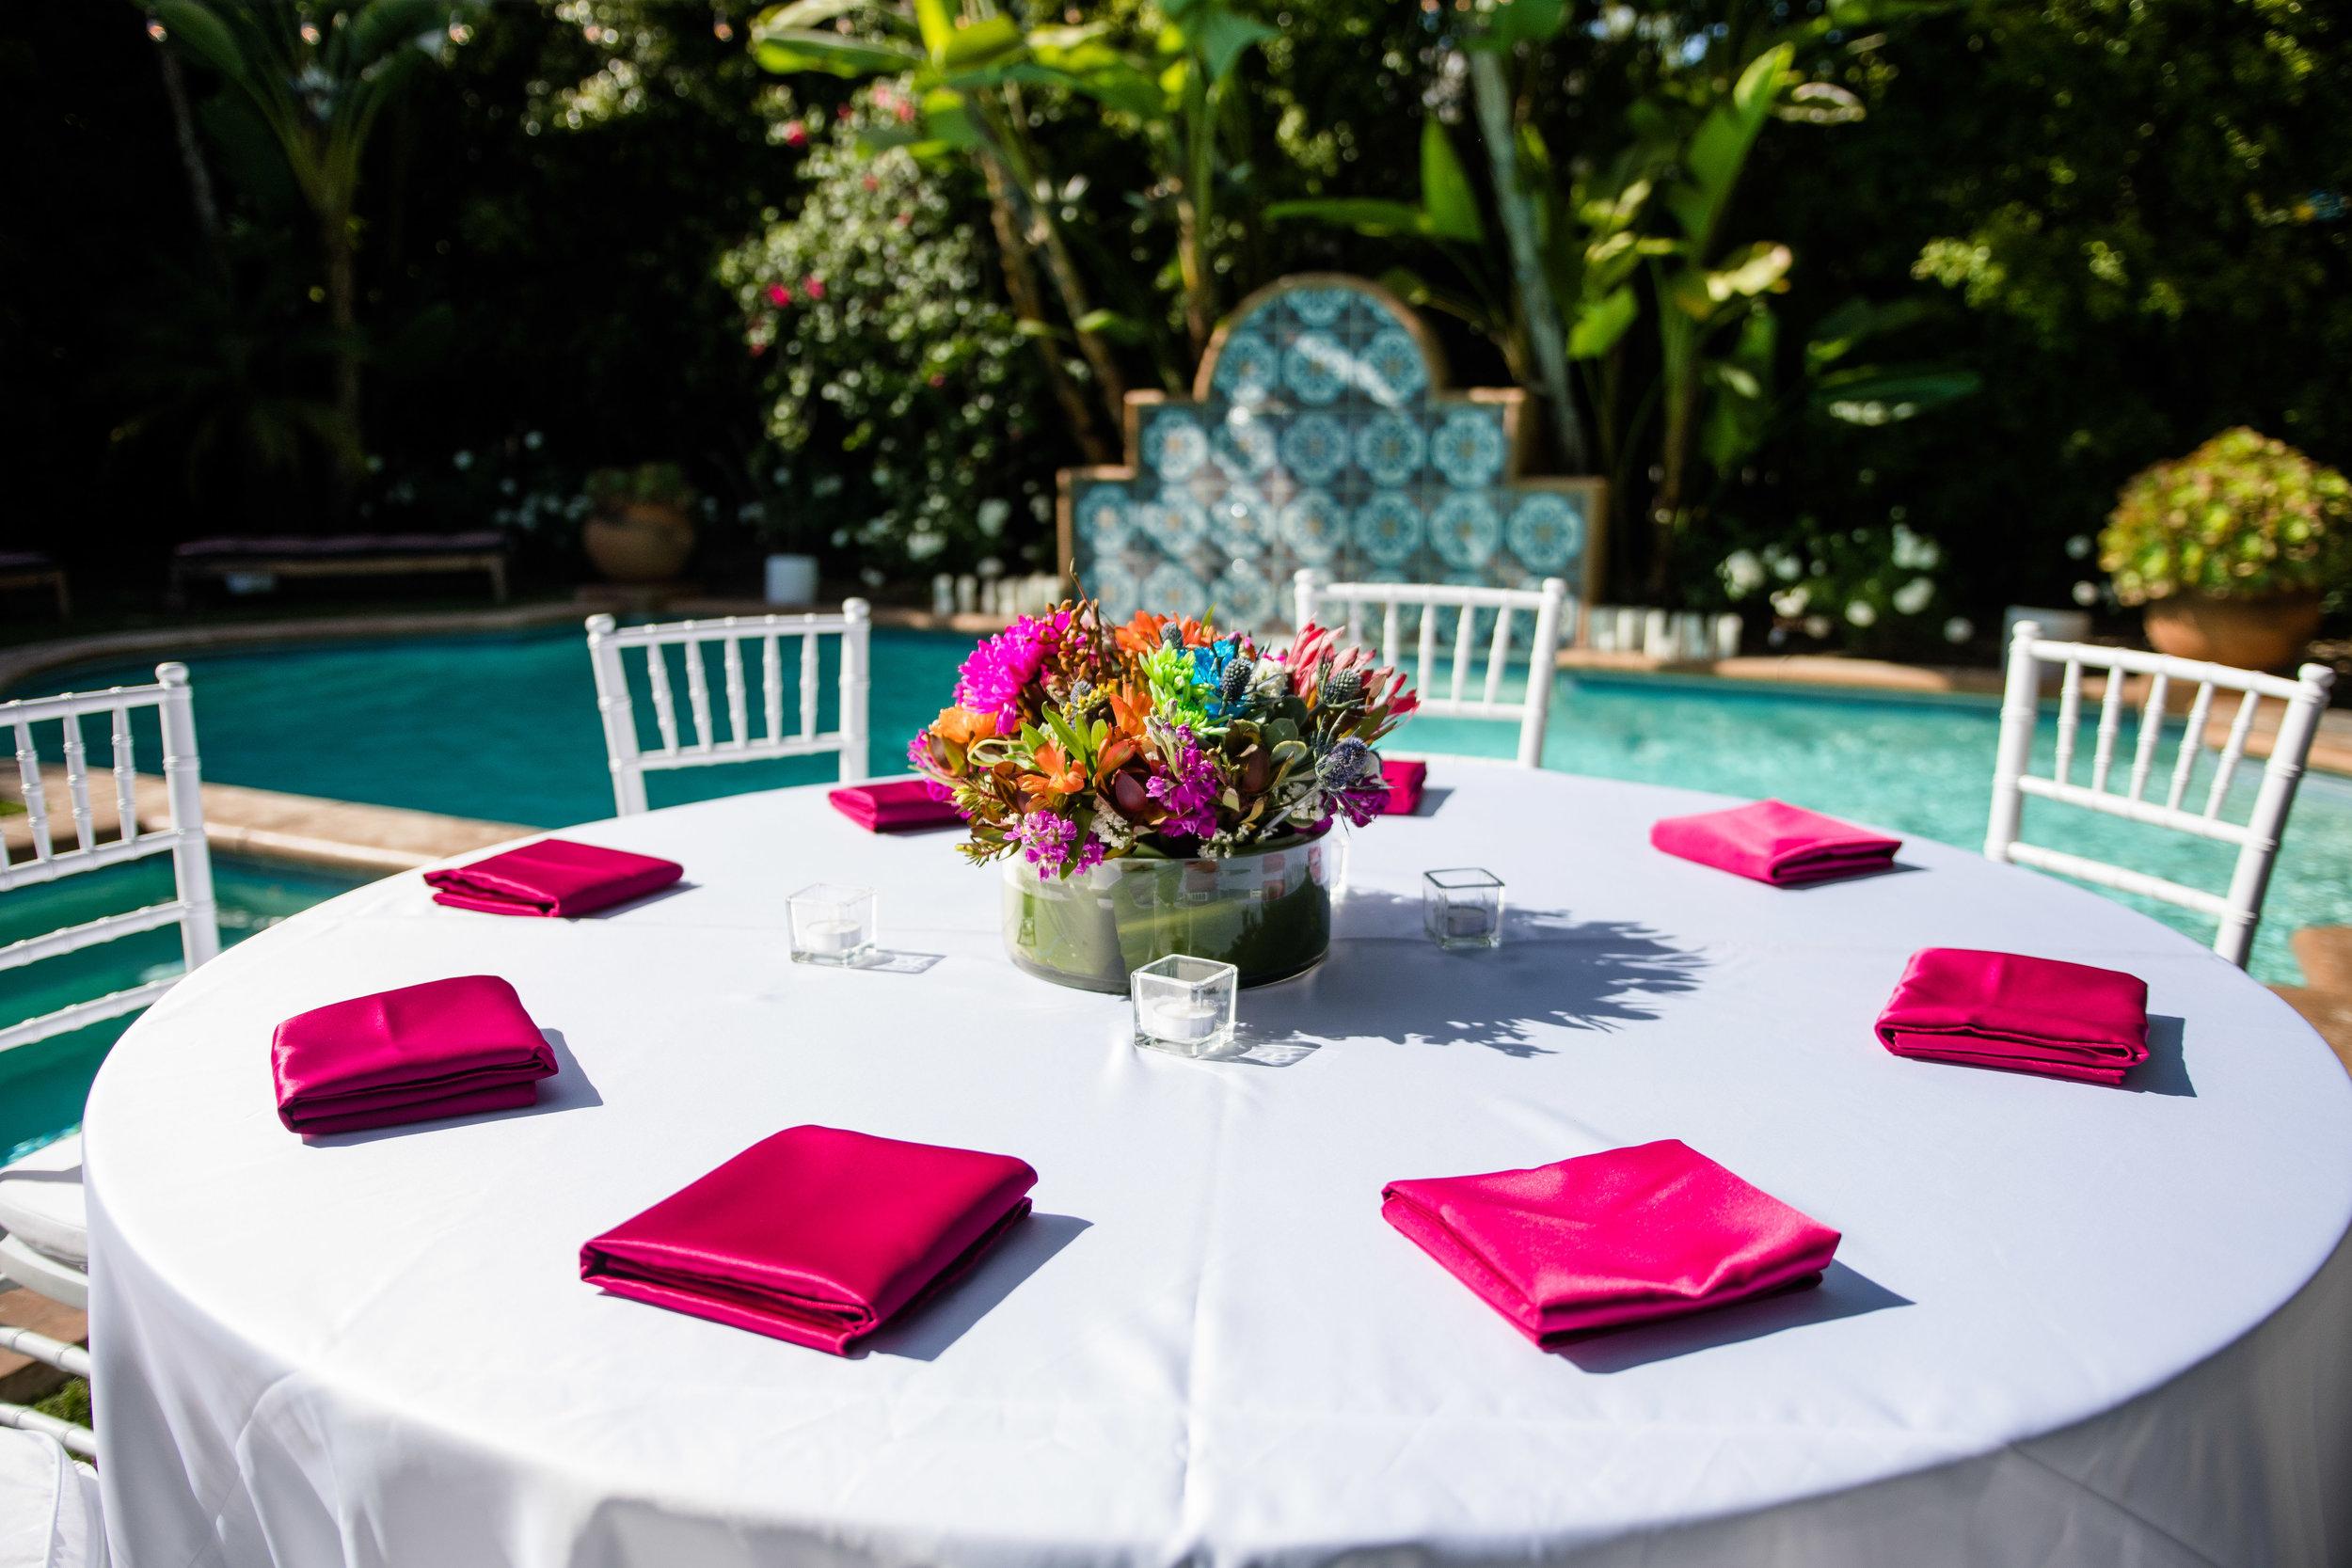 Vibrant Fiesta Backyard Wedding Reception hot pink linens and colorful centerpiece.jpg